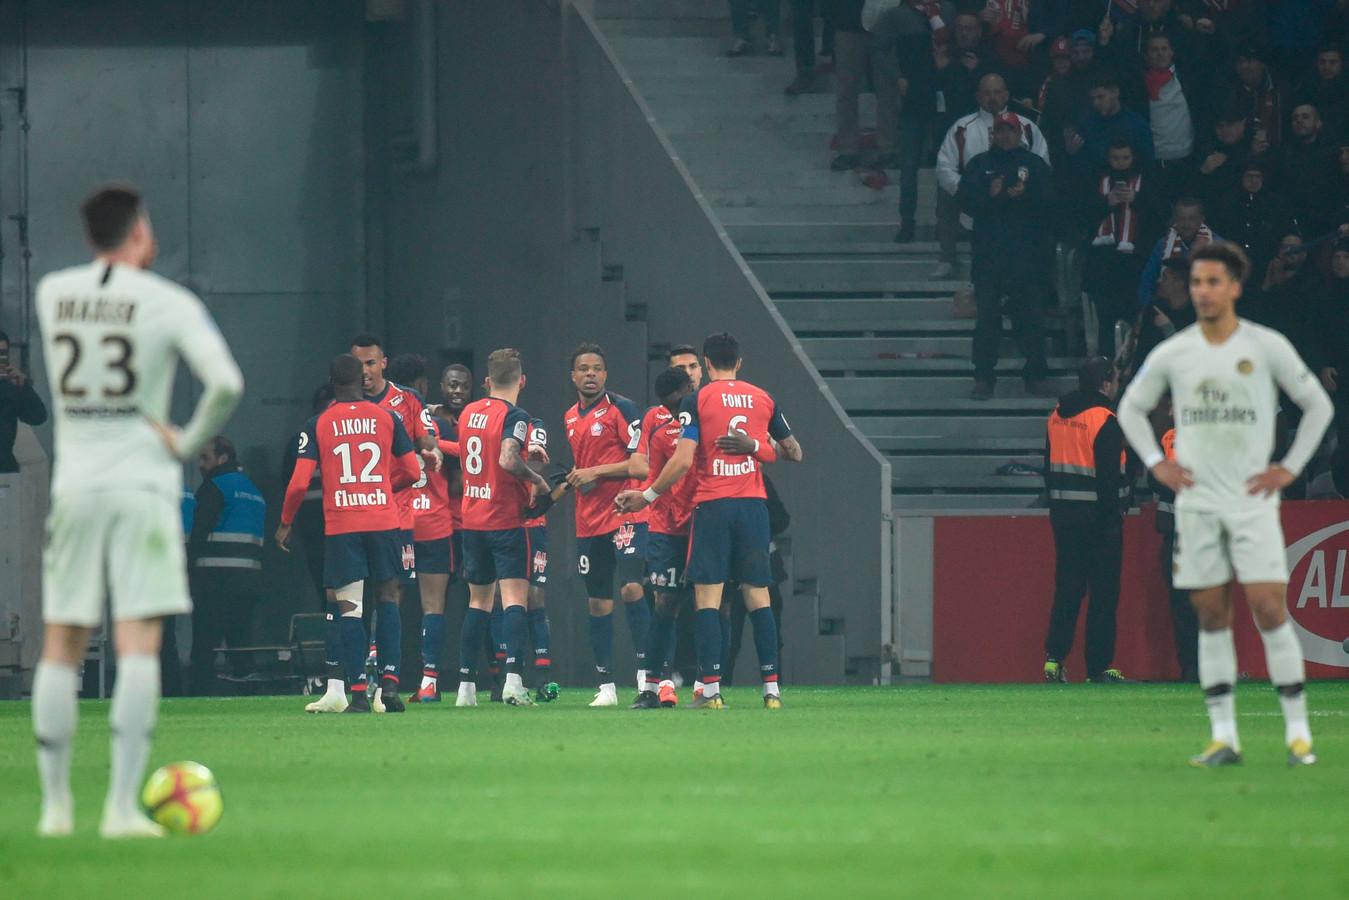 Terwijl PSG treurt, bejubelt Lille de treffer van Nicolas Pépé.